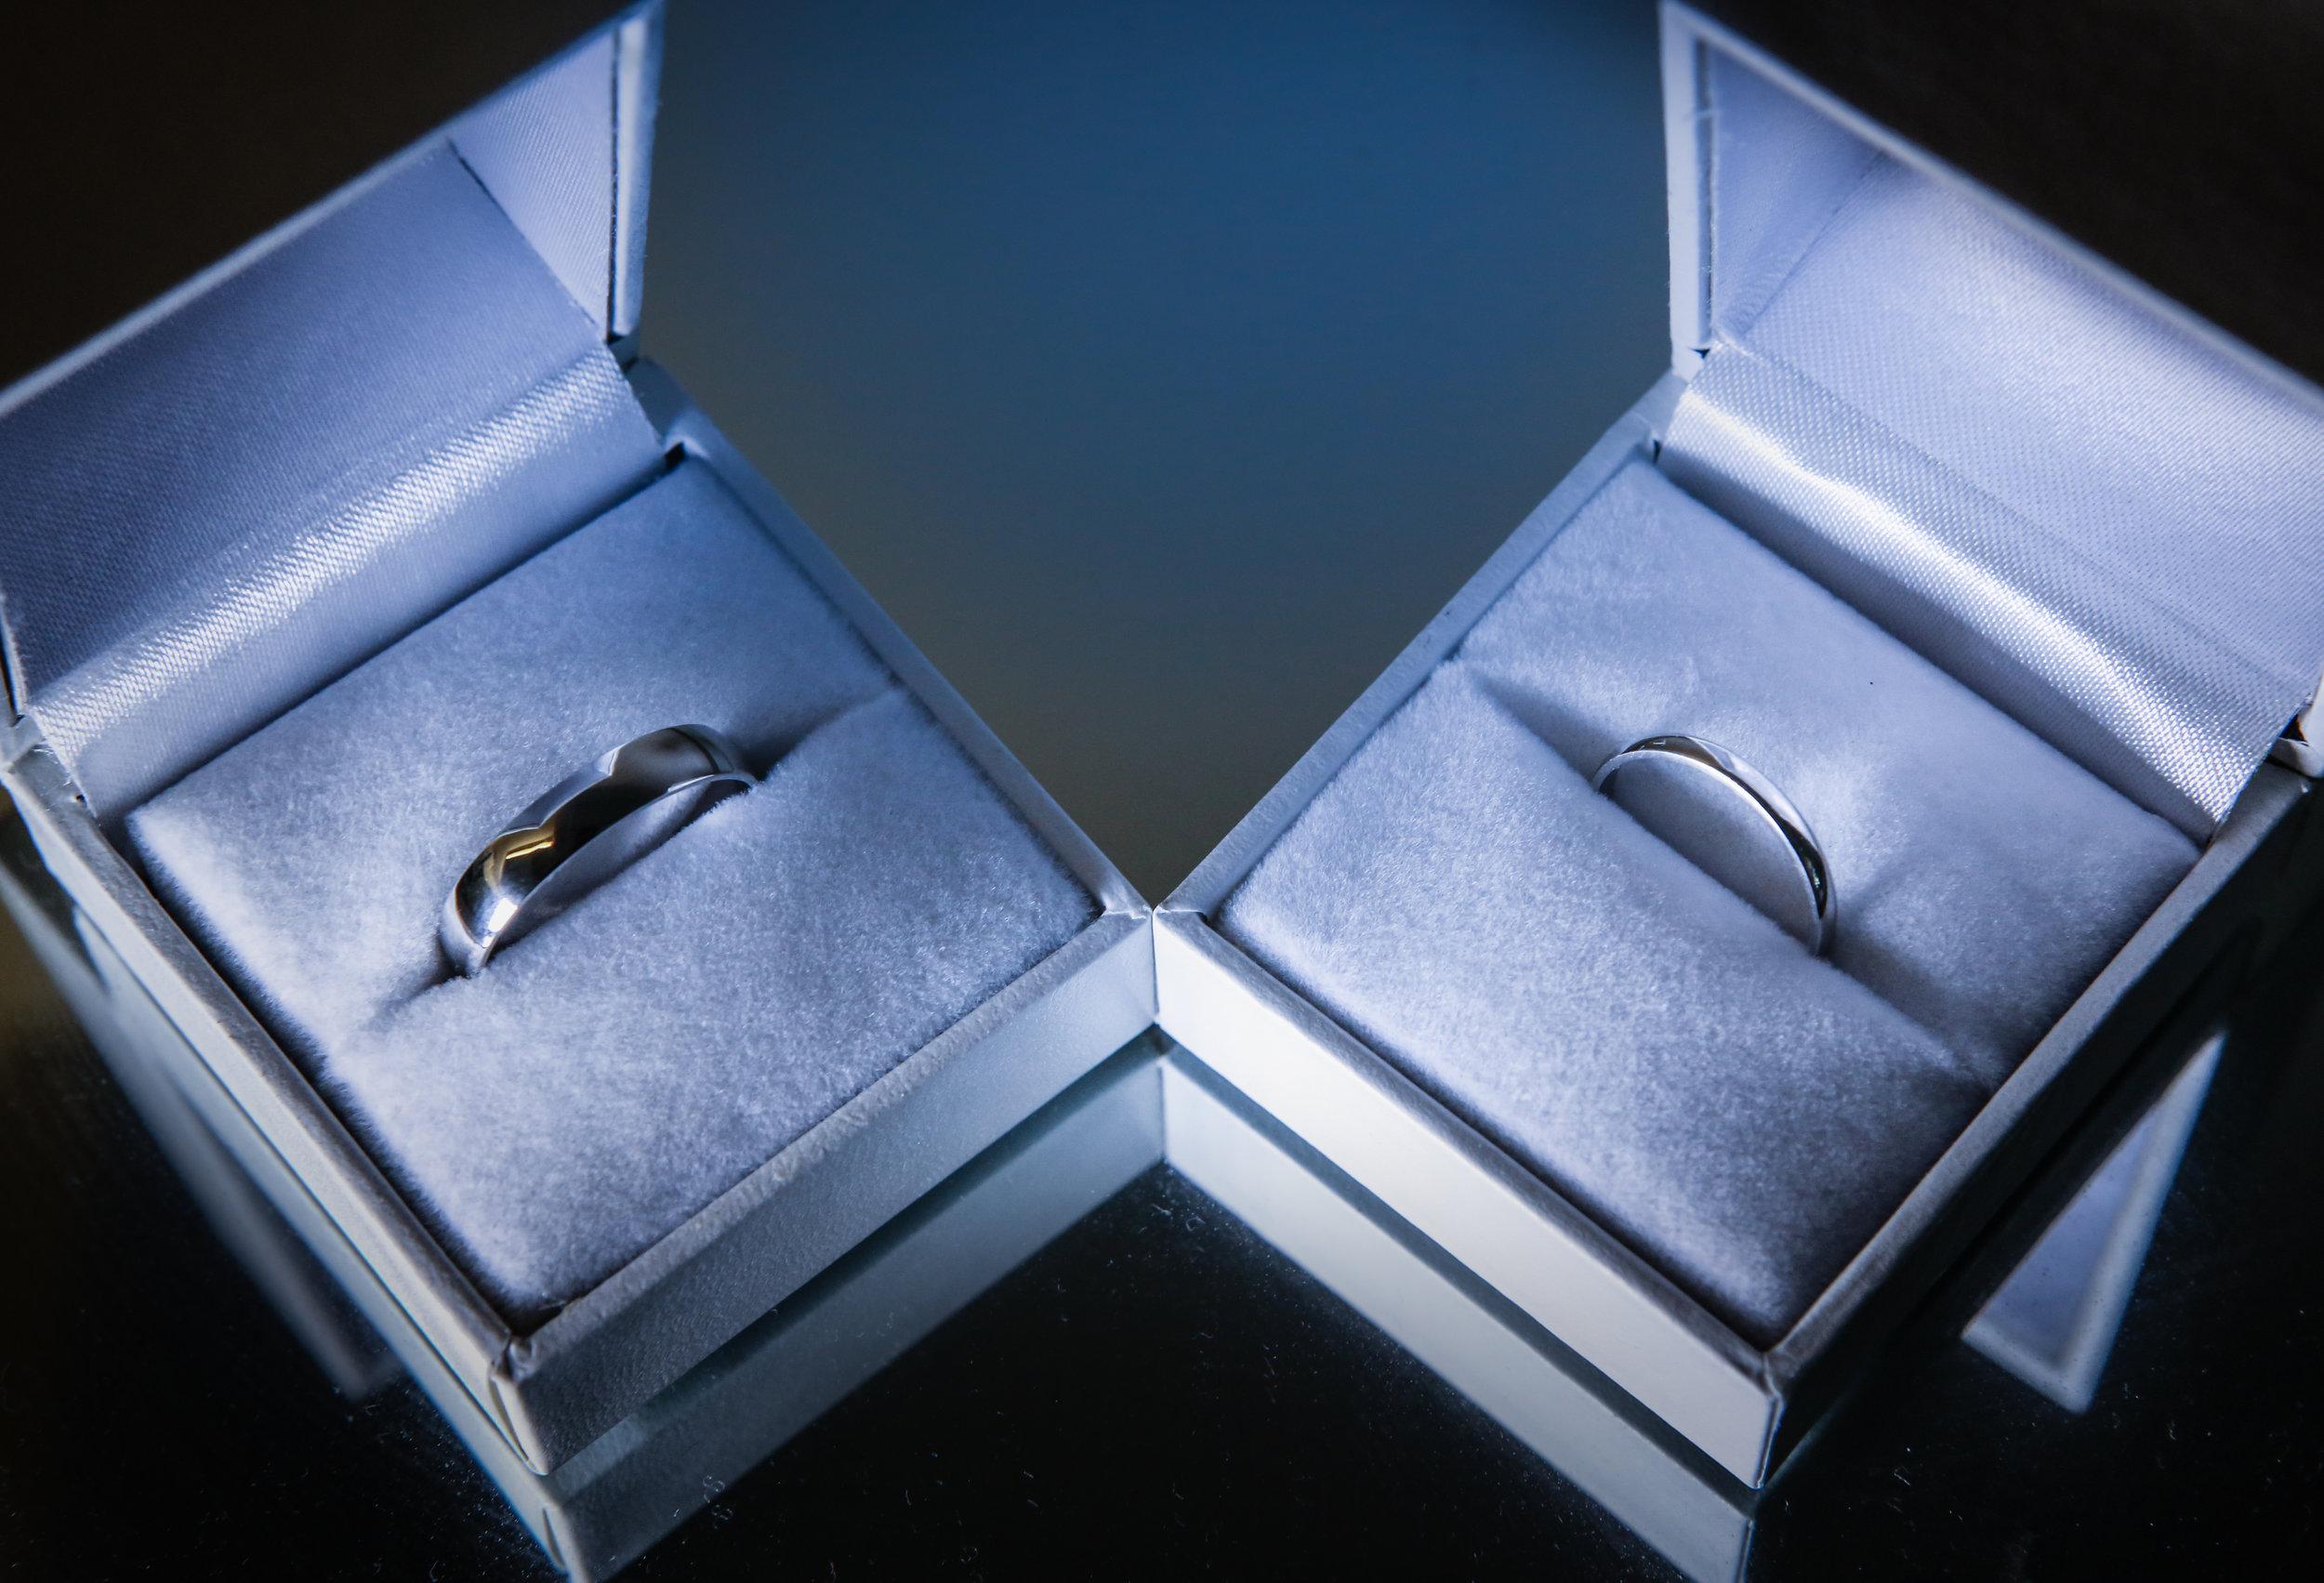 reigate-surrey-london-wedding-photography-rings-01